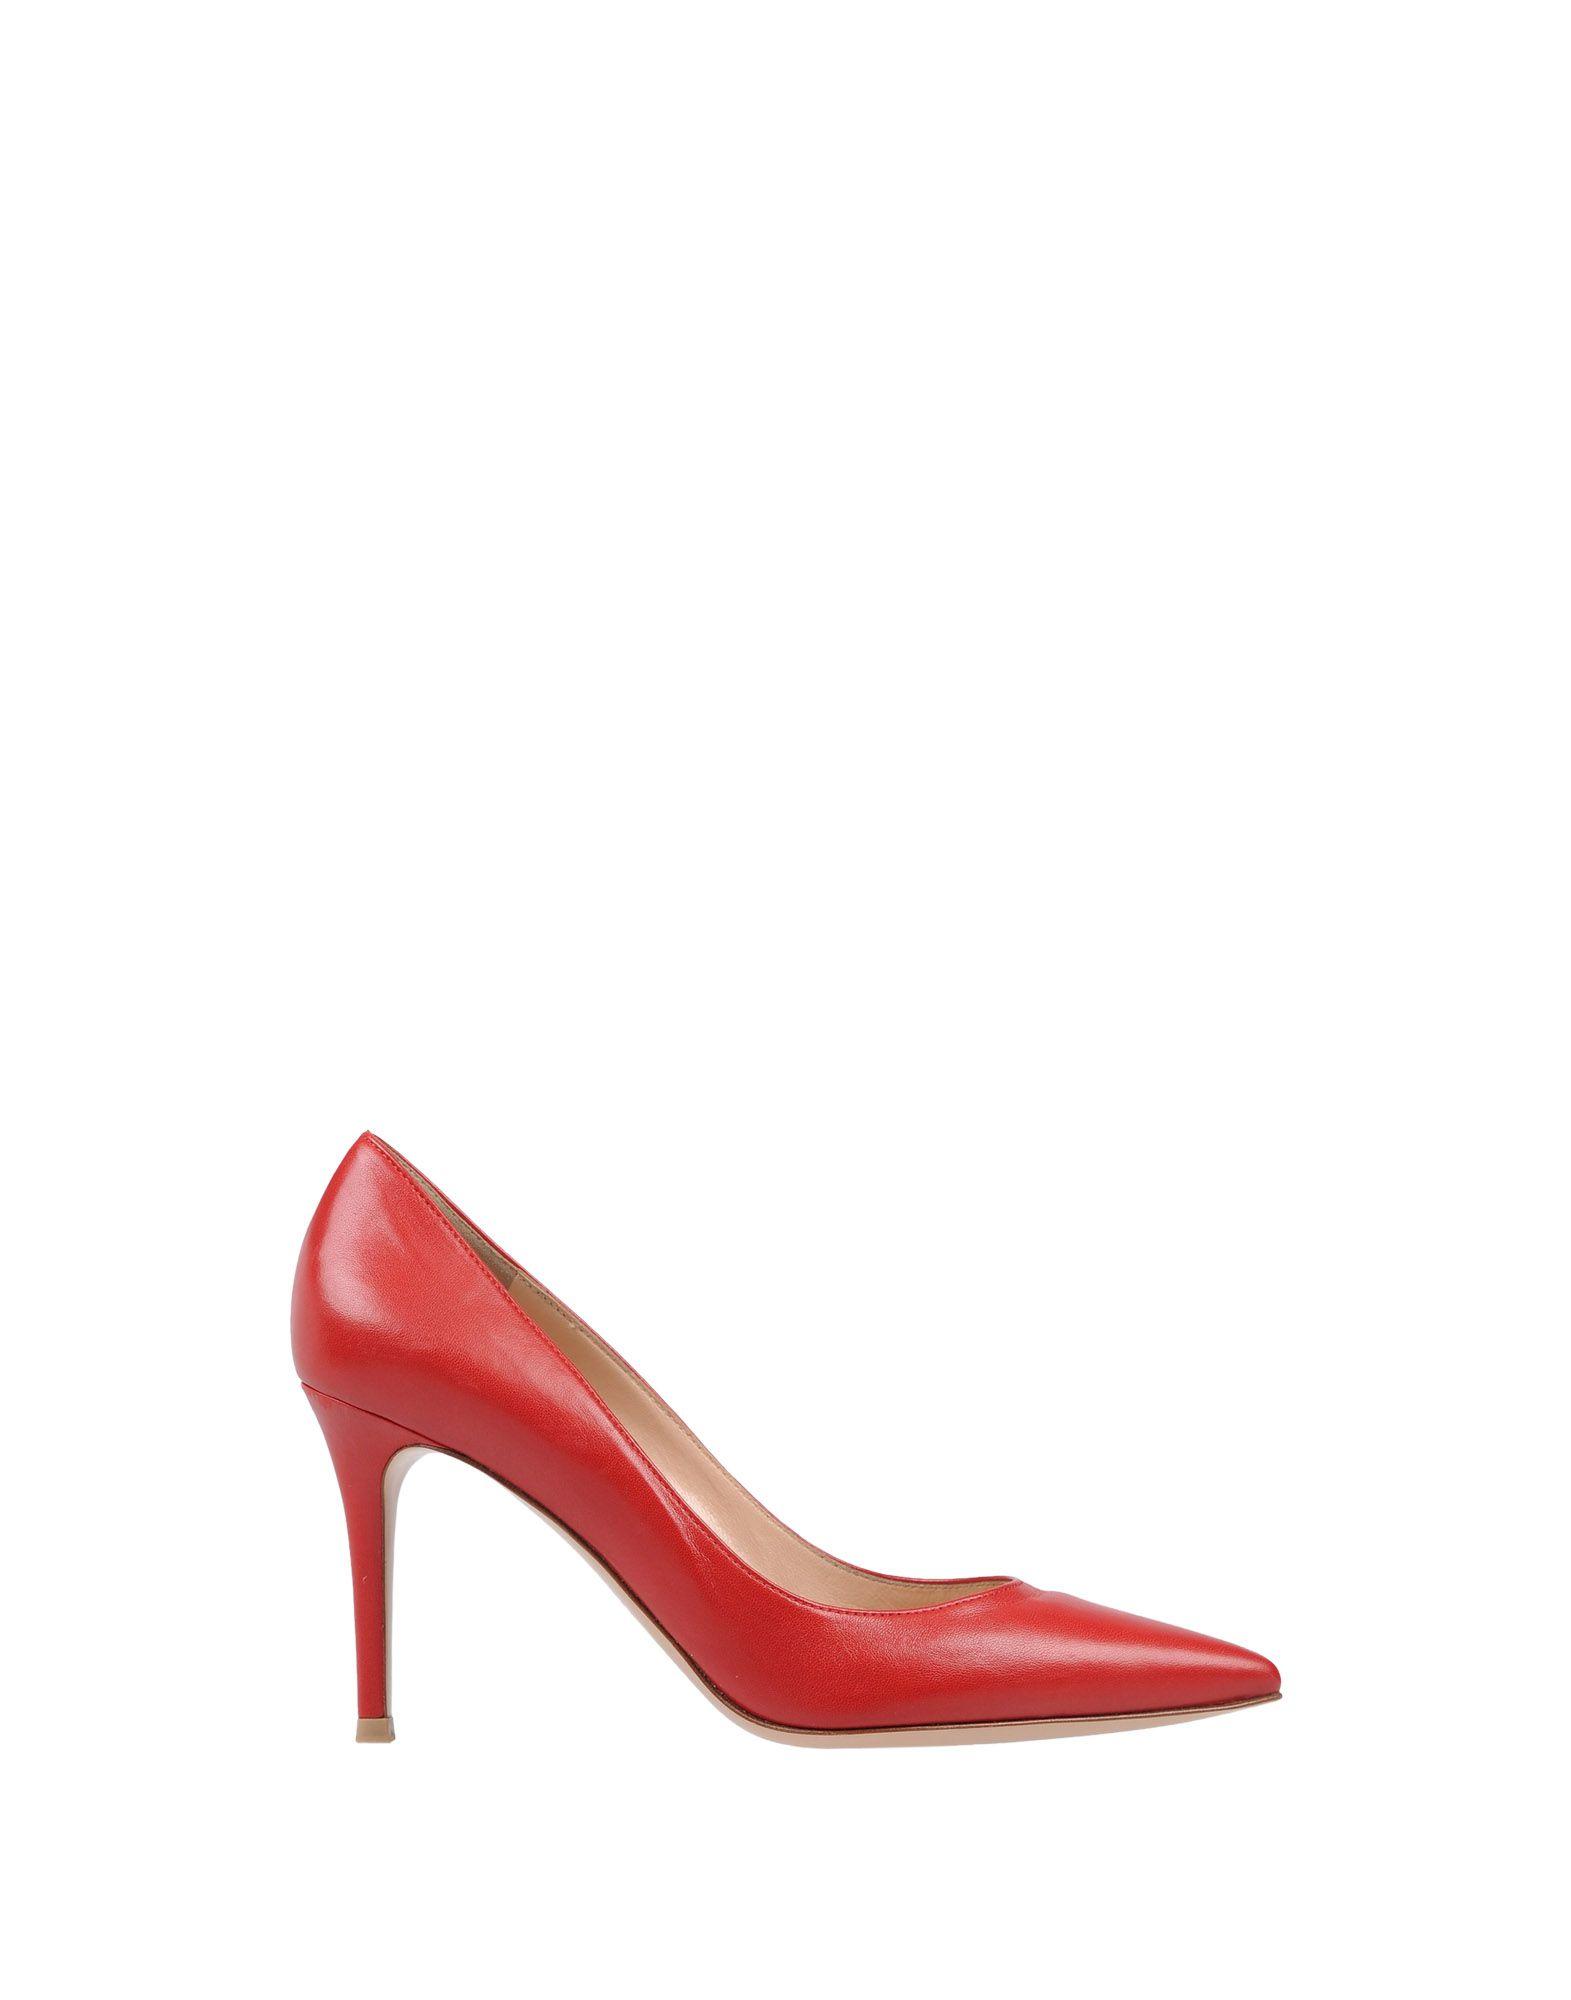 Gianvito Rossi Pumps Damen Schuhe  11483496MUGünstige gut aussehende Schuhe Damen 80d5bc